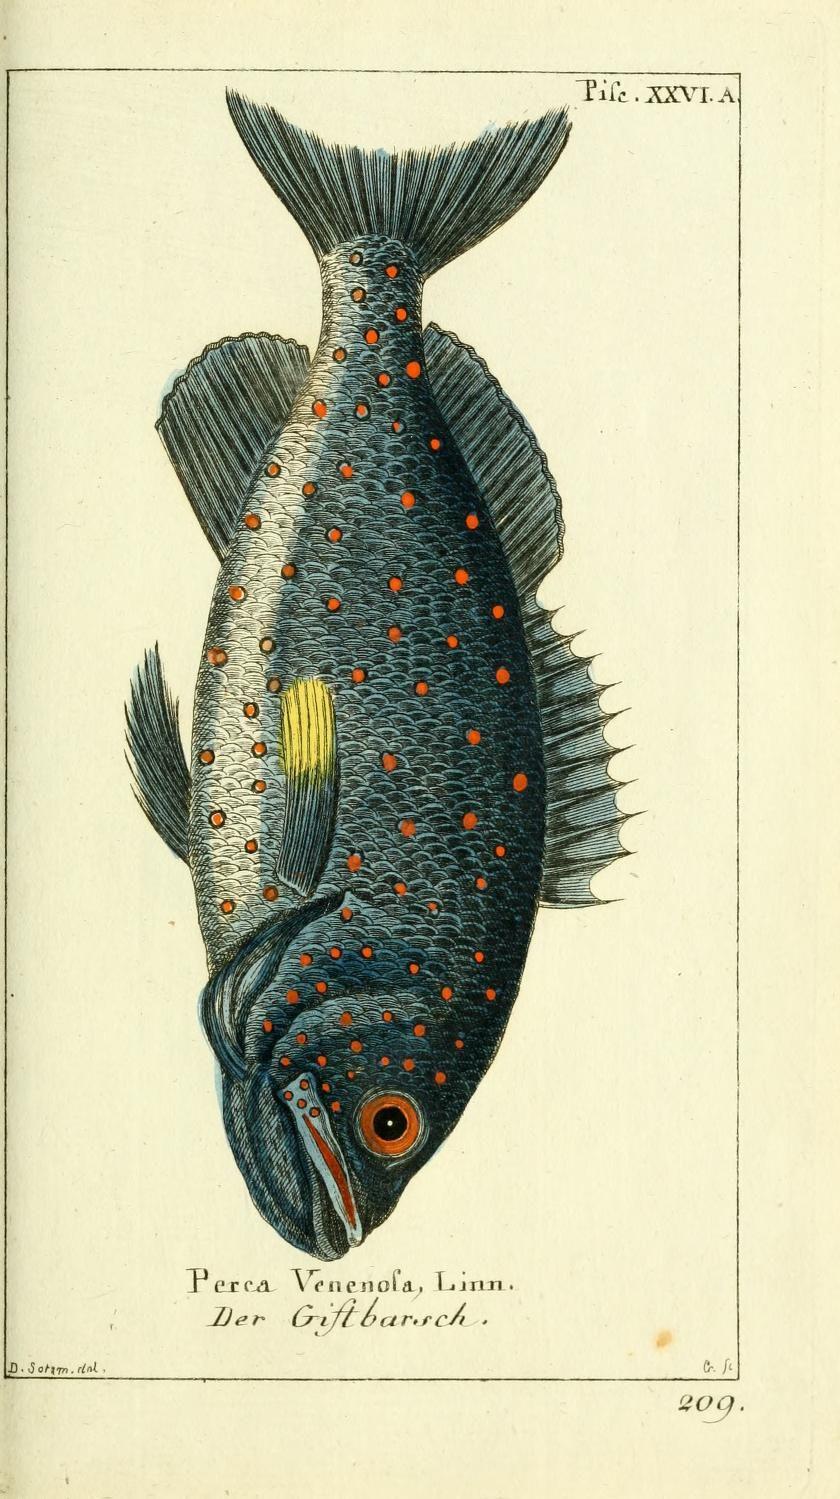 Pin de Tina Kruse en Print | Pinterest | Taxonomia, Historia natural ...